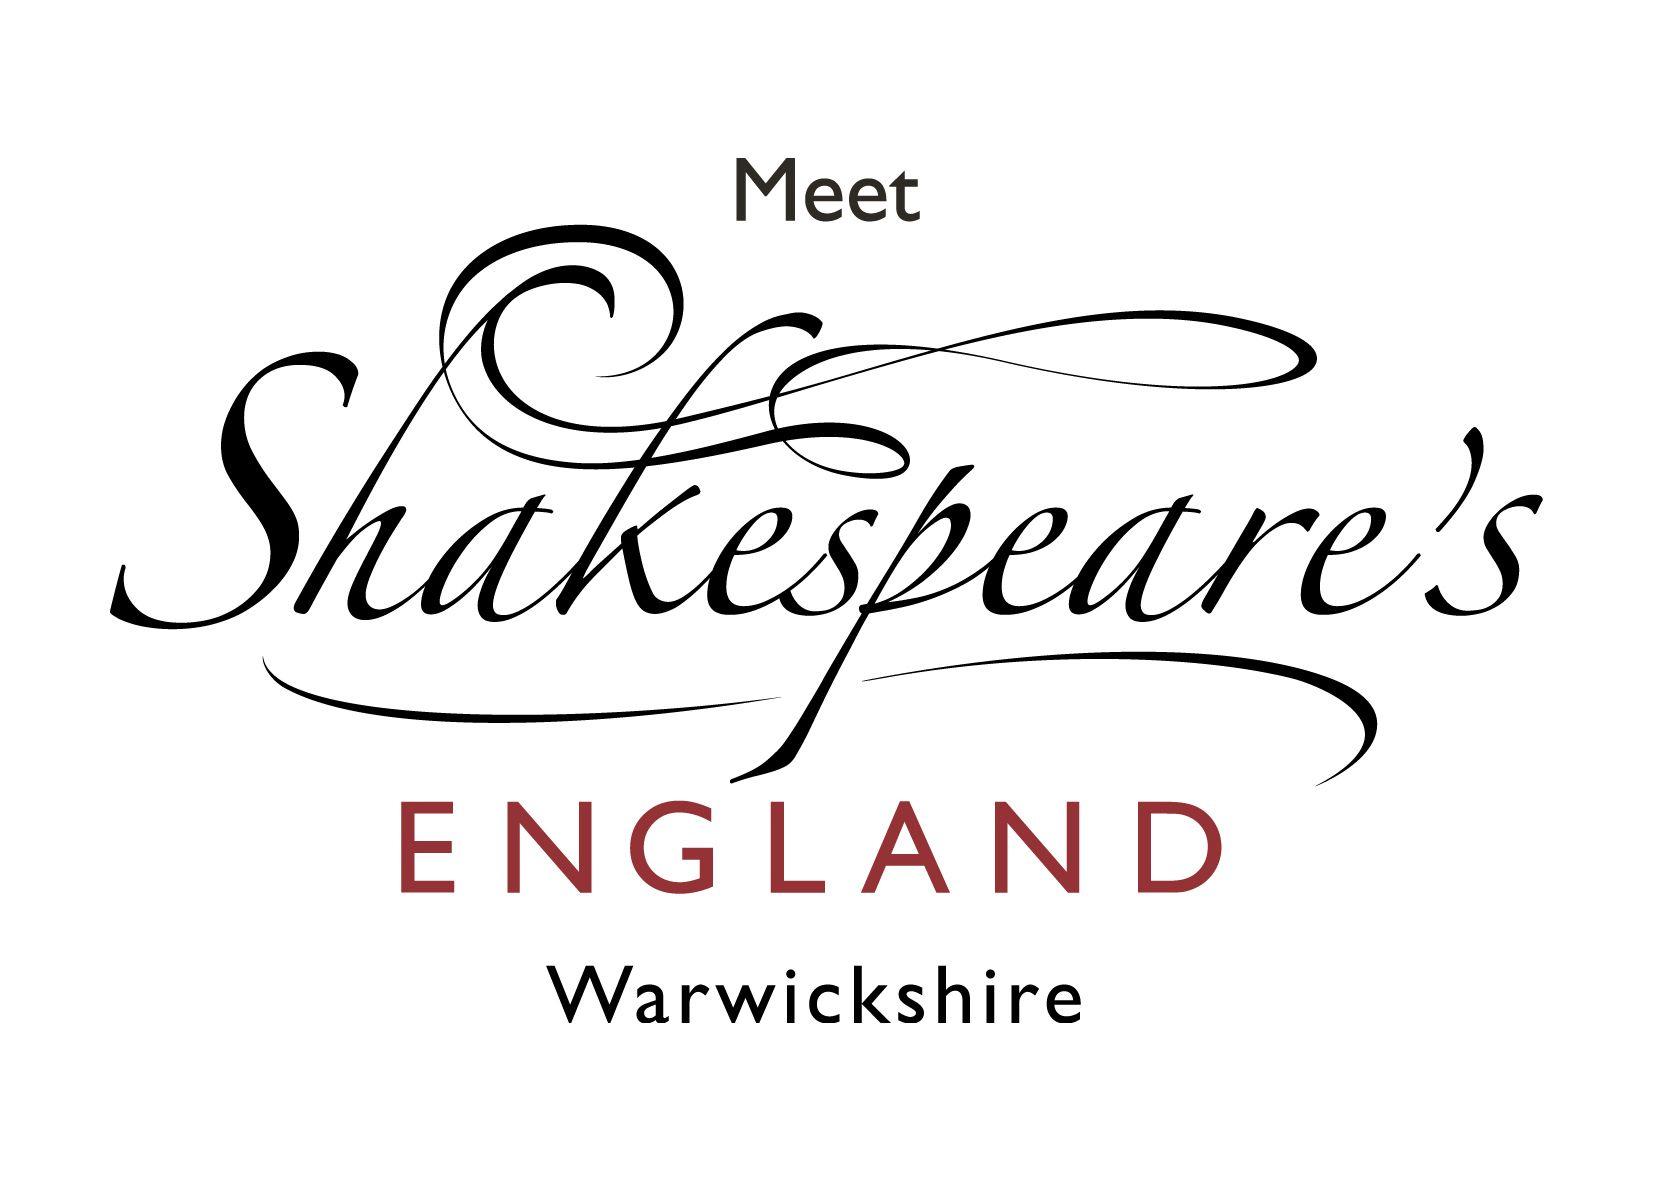 Visit Shakespeare's England